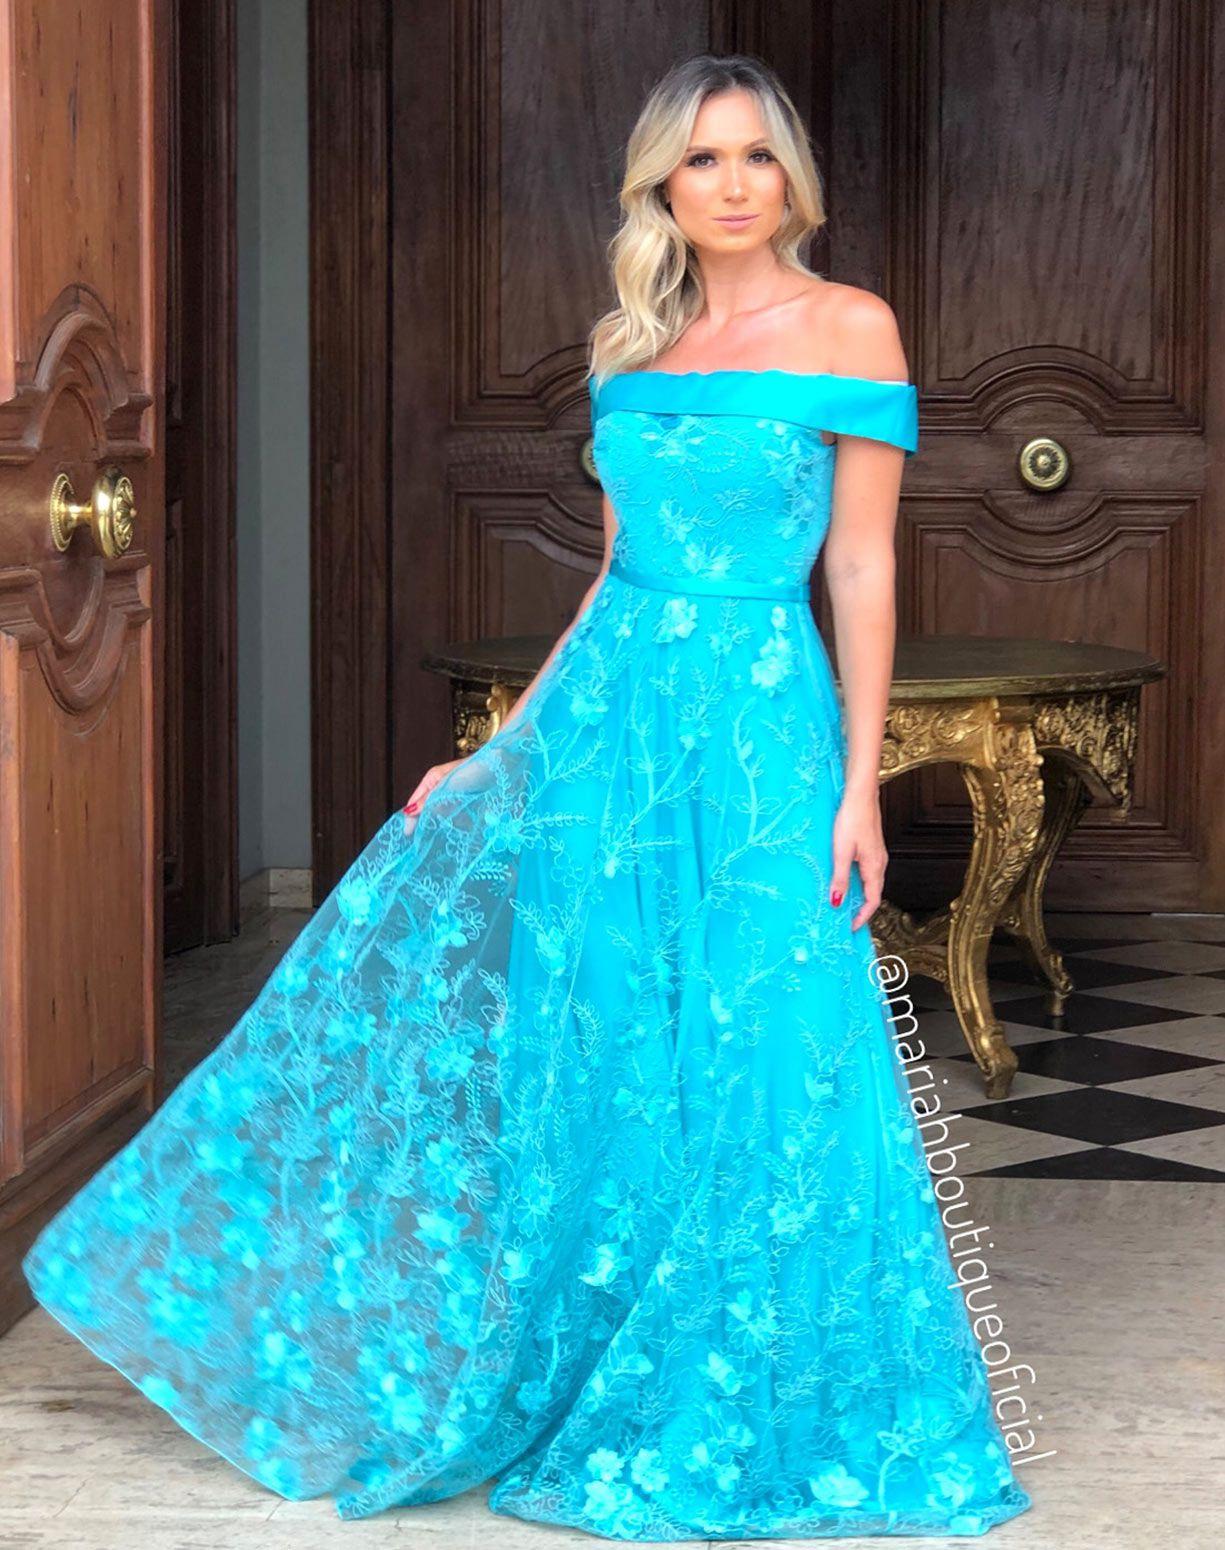 Vestido Tiffany em Renda Decote Ombro a Ombro